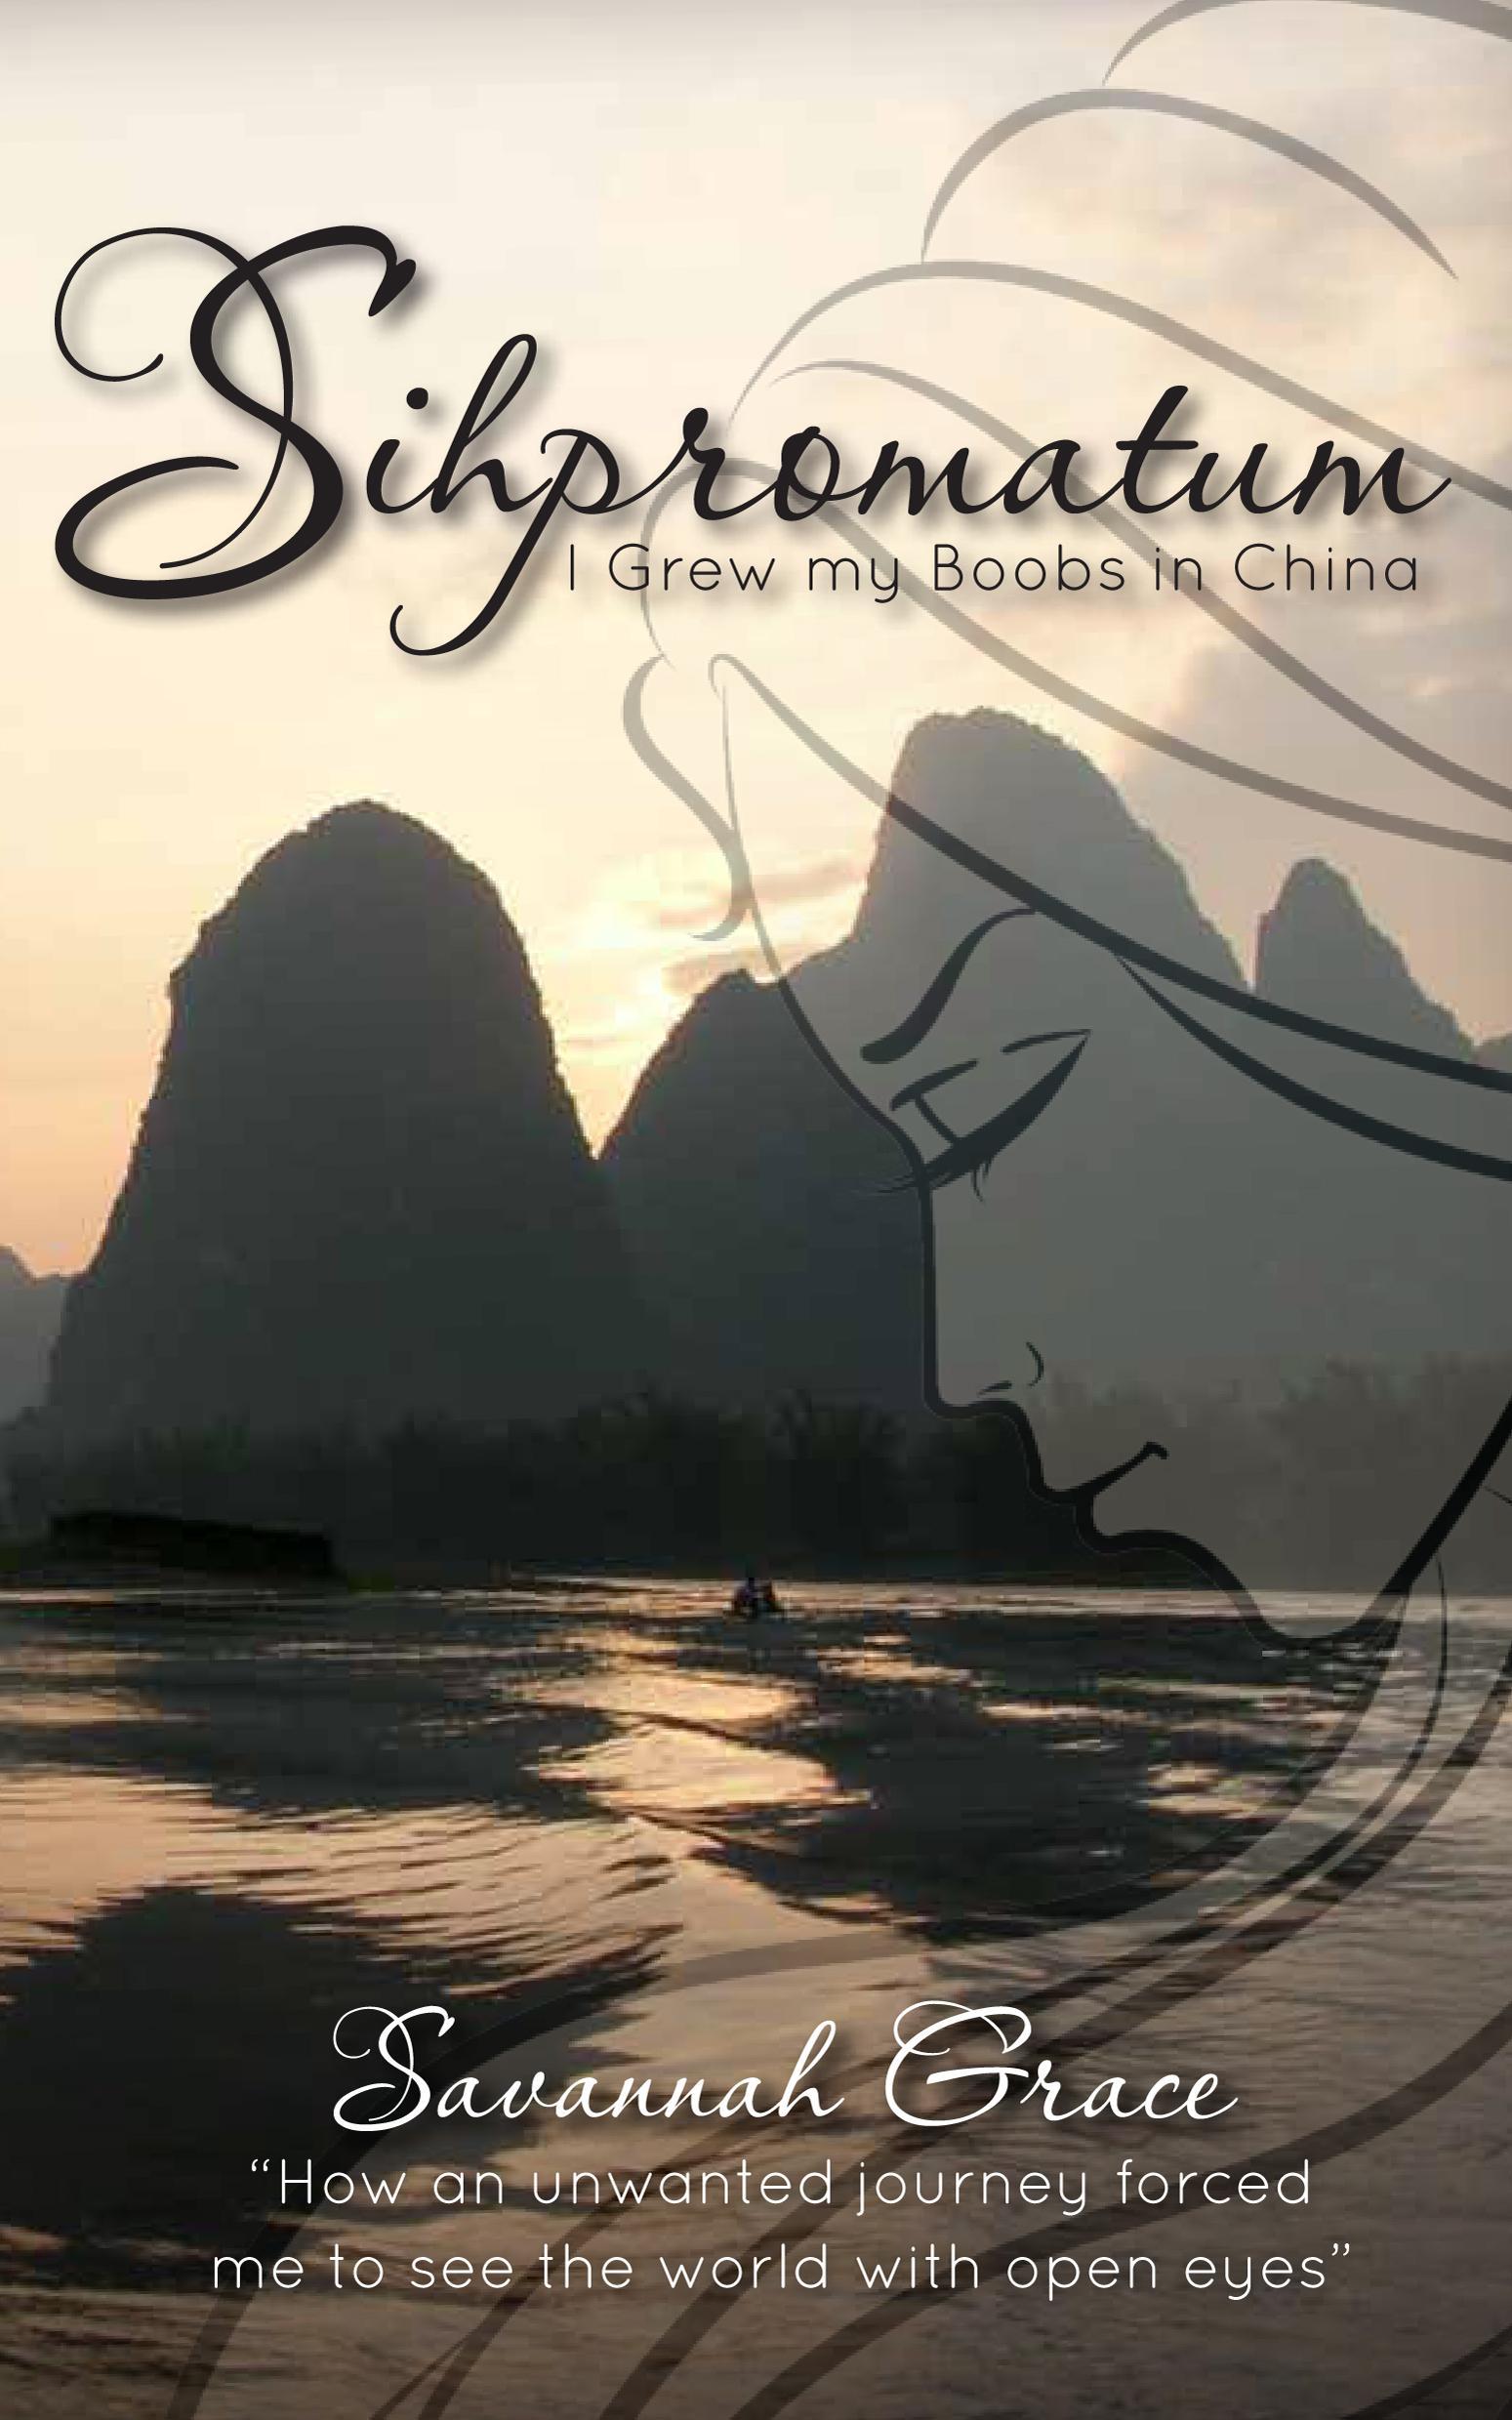 sihpromatum-book-cover